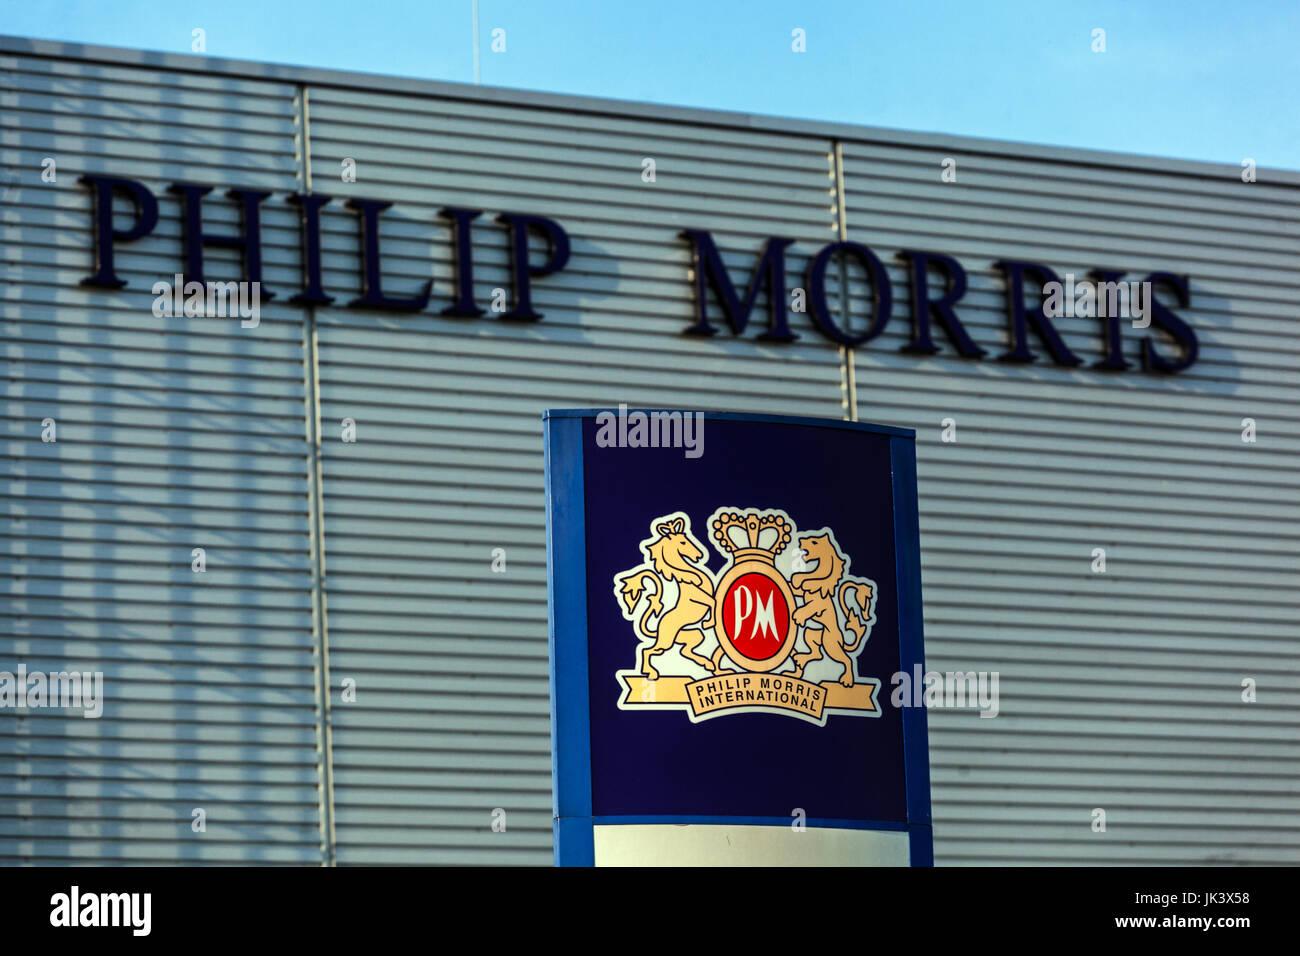 Tobacco factory, Philip Morris International, logo, sign